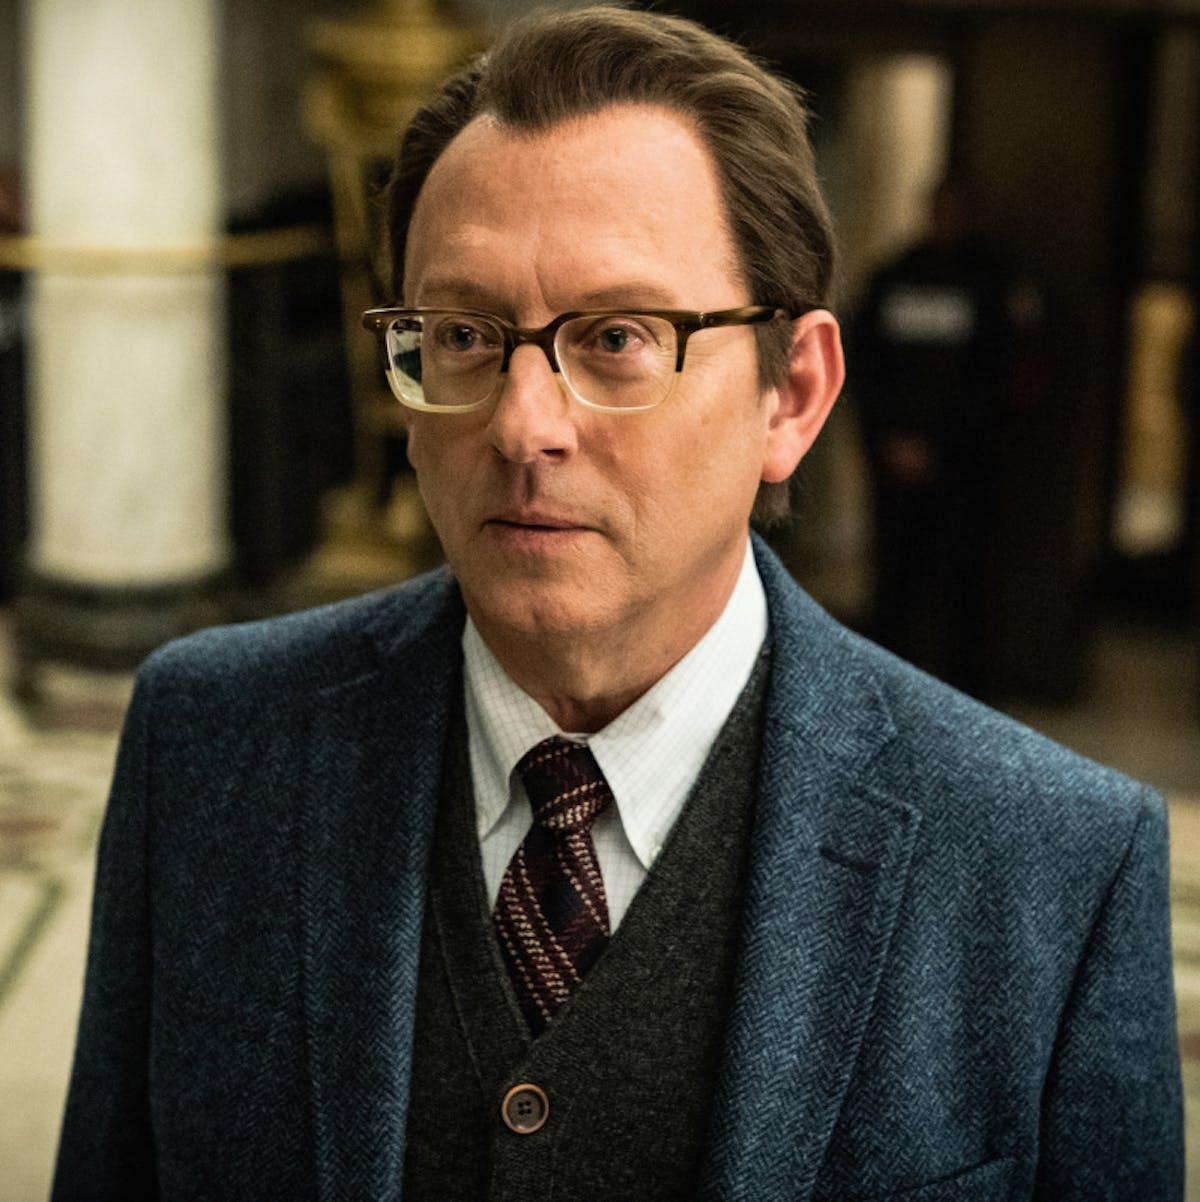 'Evil' CBS Show: Michael Emerson Talks New Role, 'Lost's Controversial End